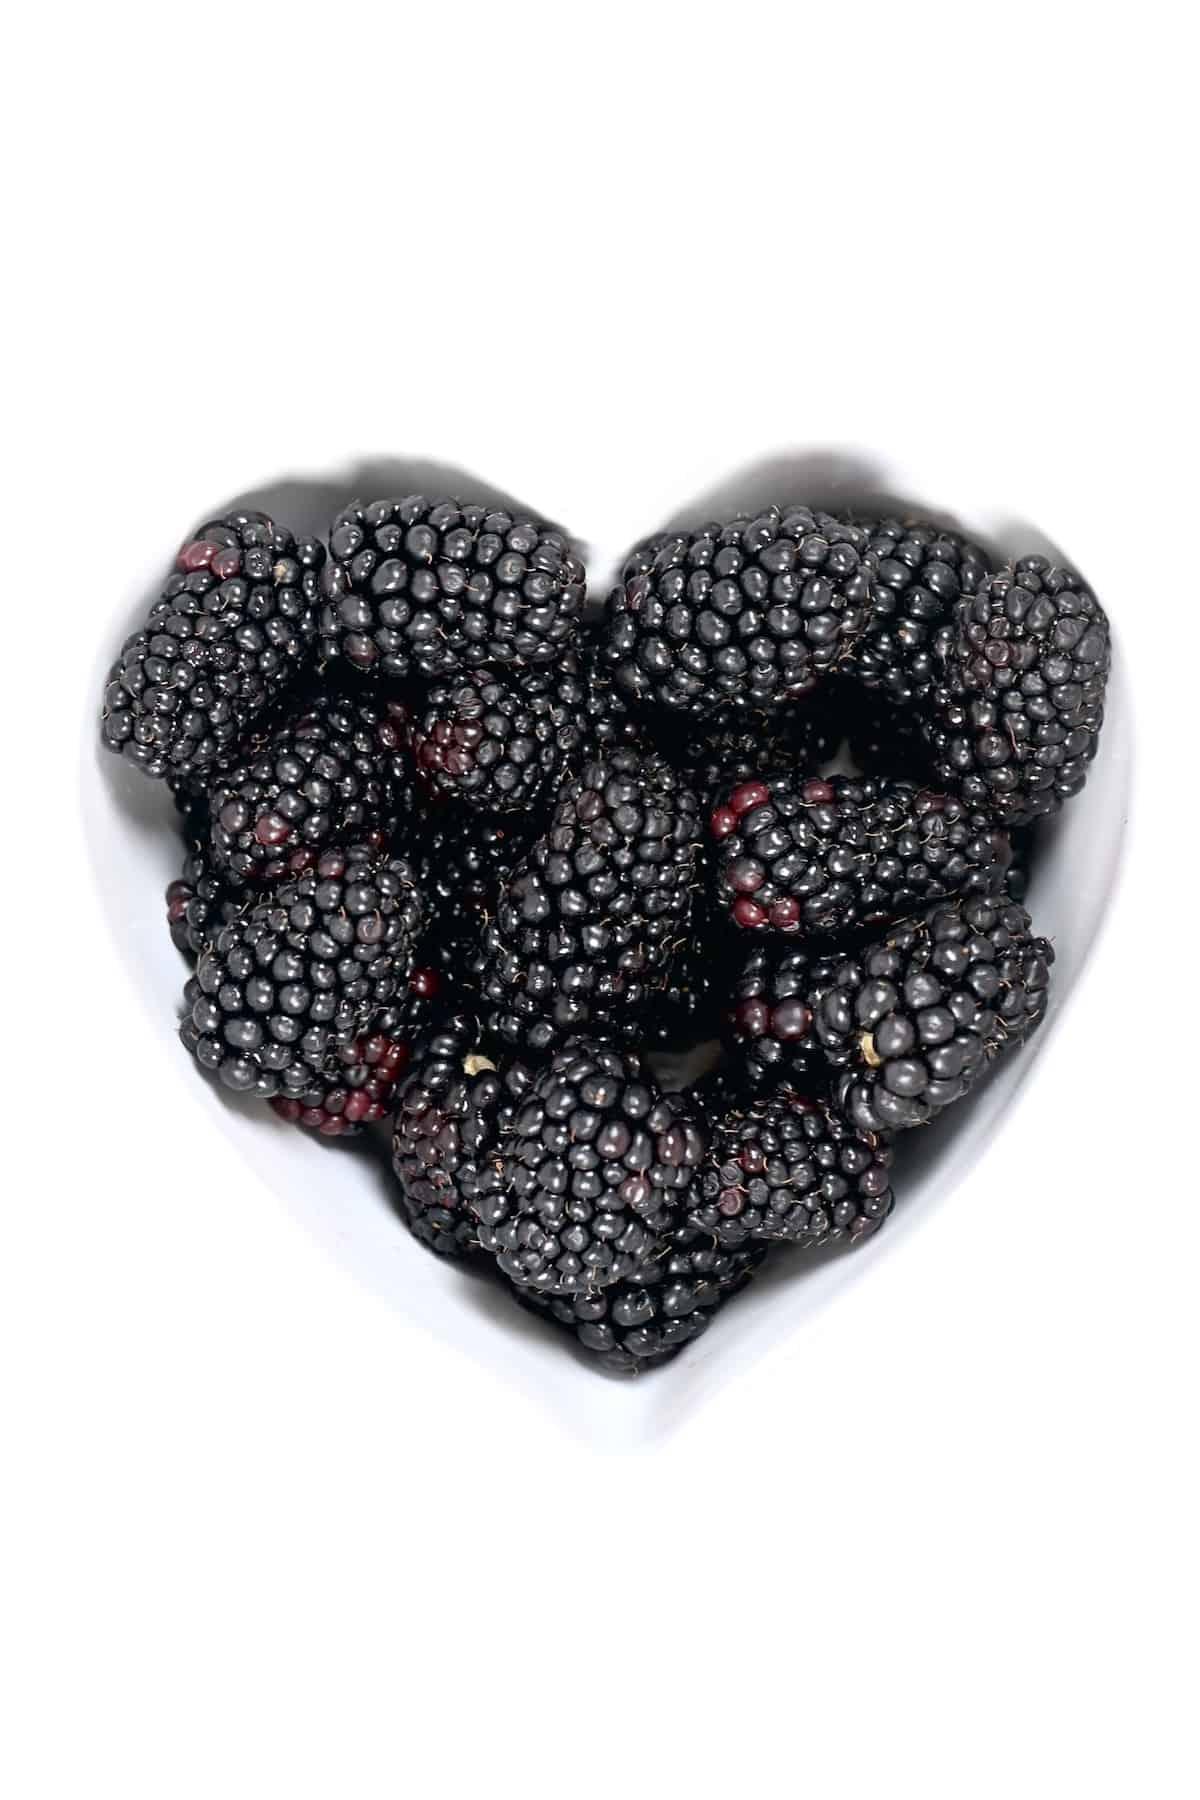 Blackberries in a heart shaped bowl